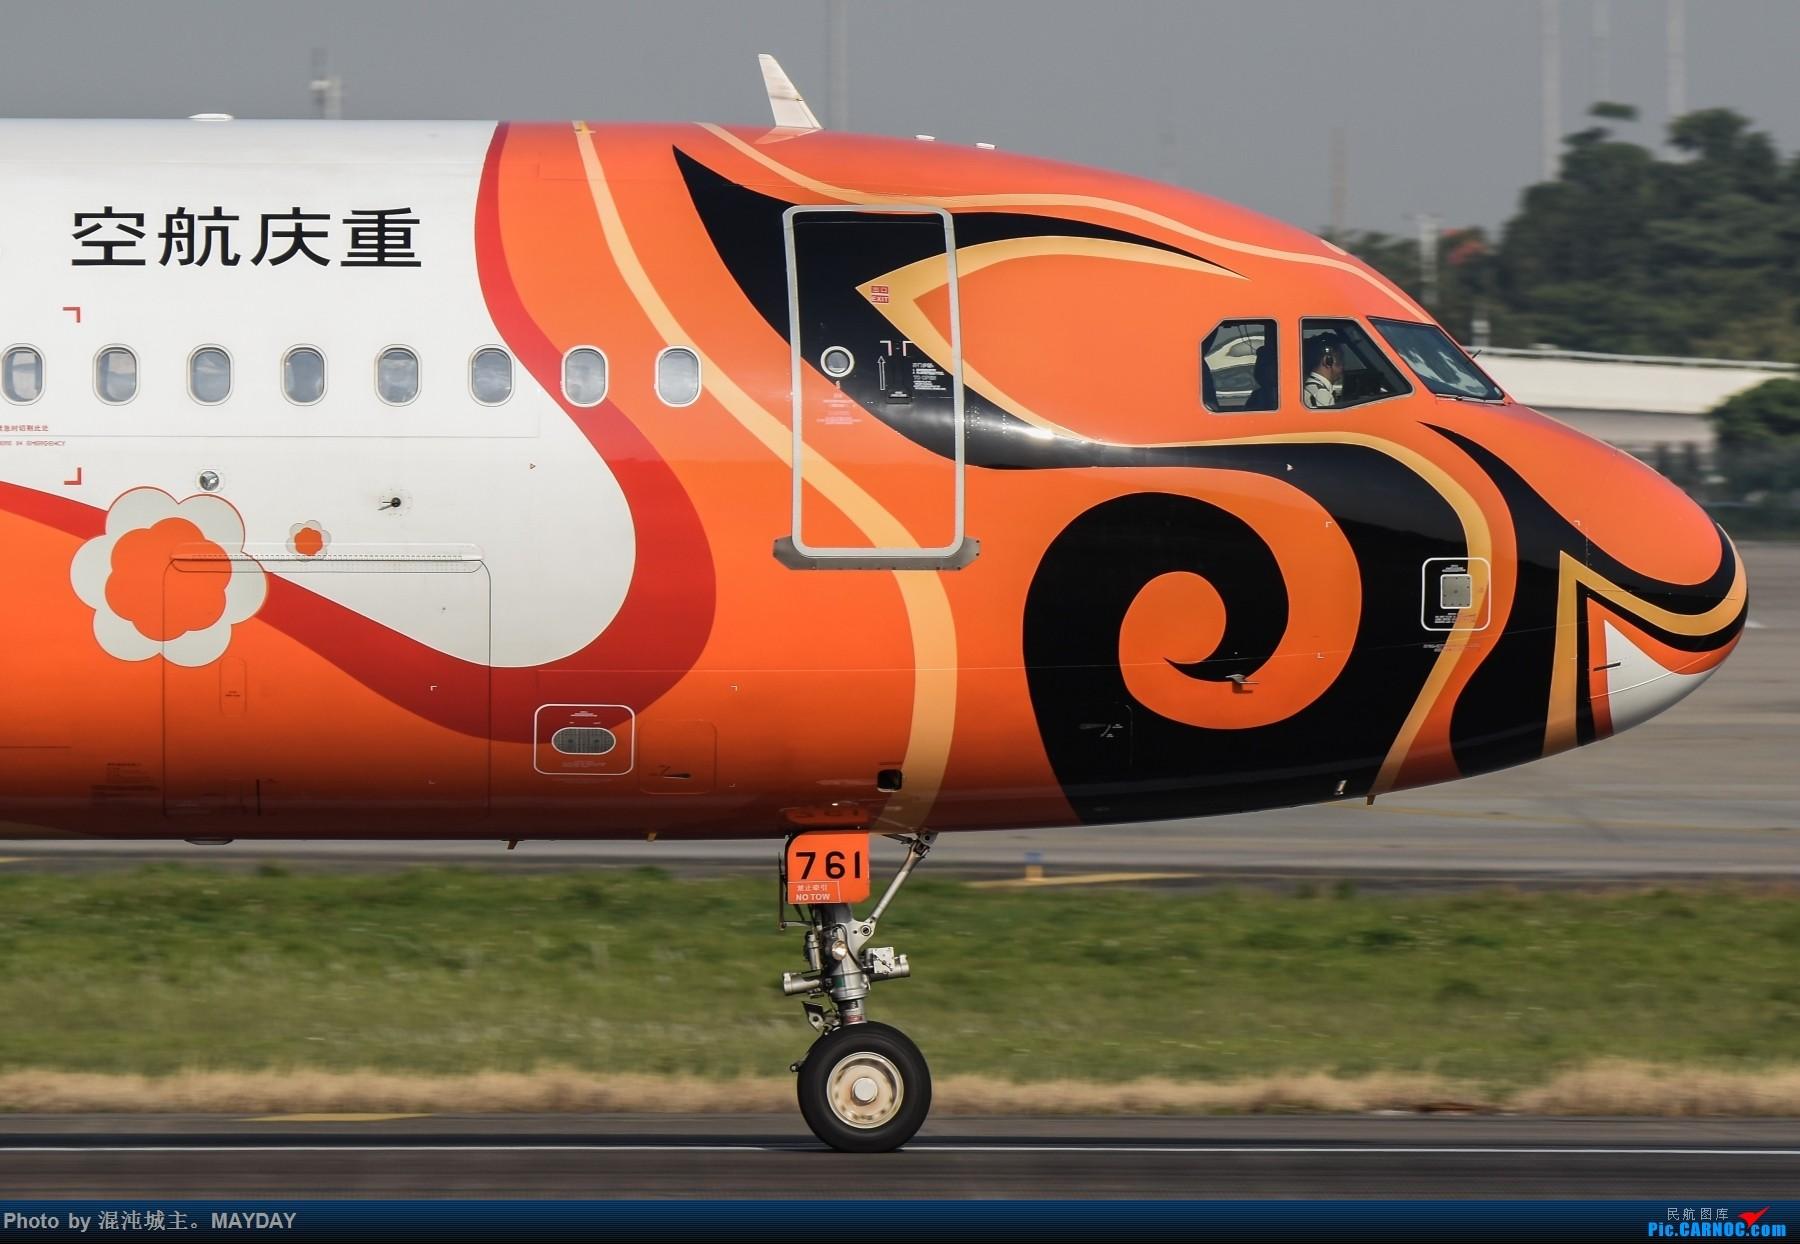 Re:[原创]试镜..细节. AIRBUS A320-200 B-6761 中国广州白云国际机场